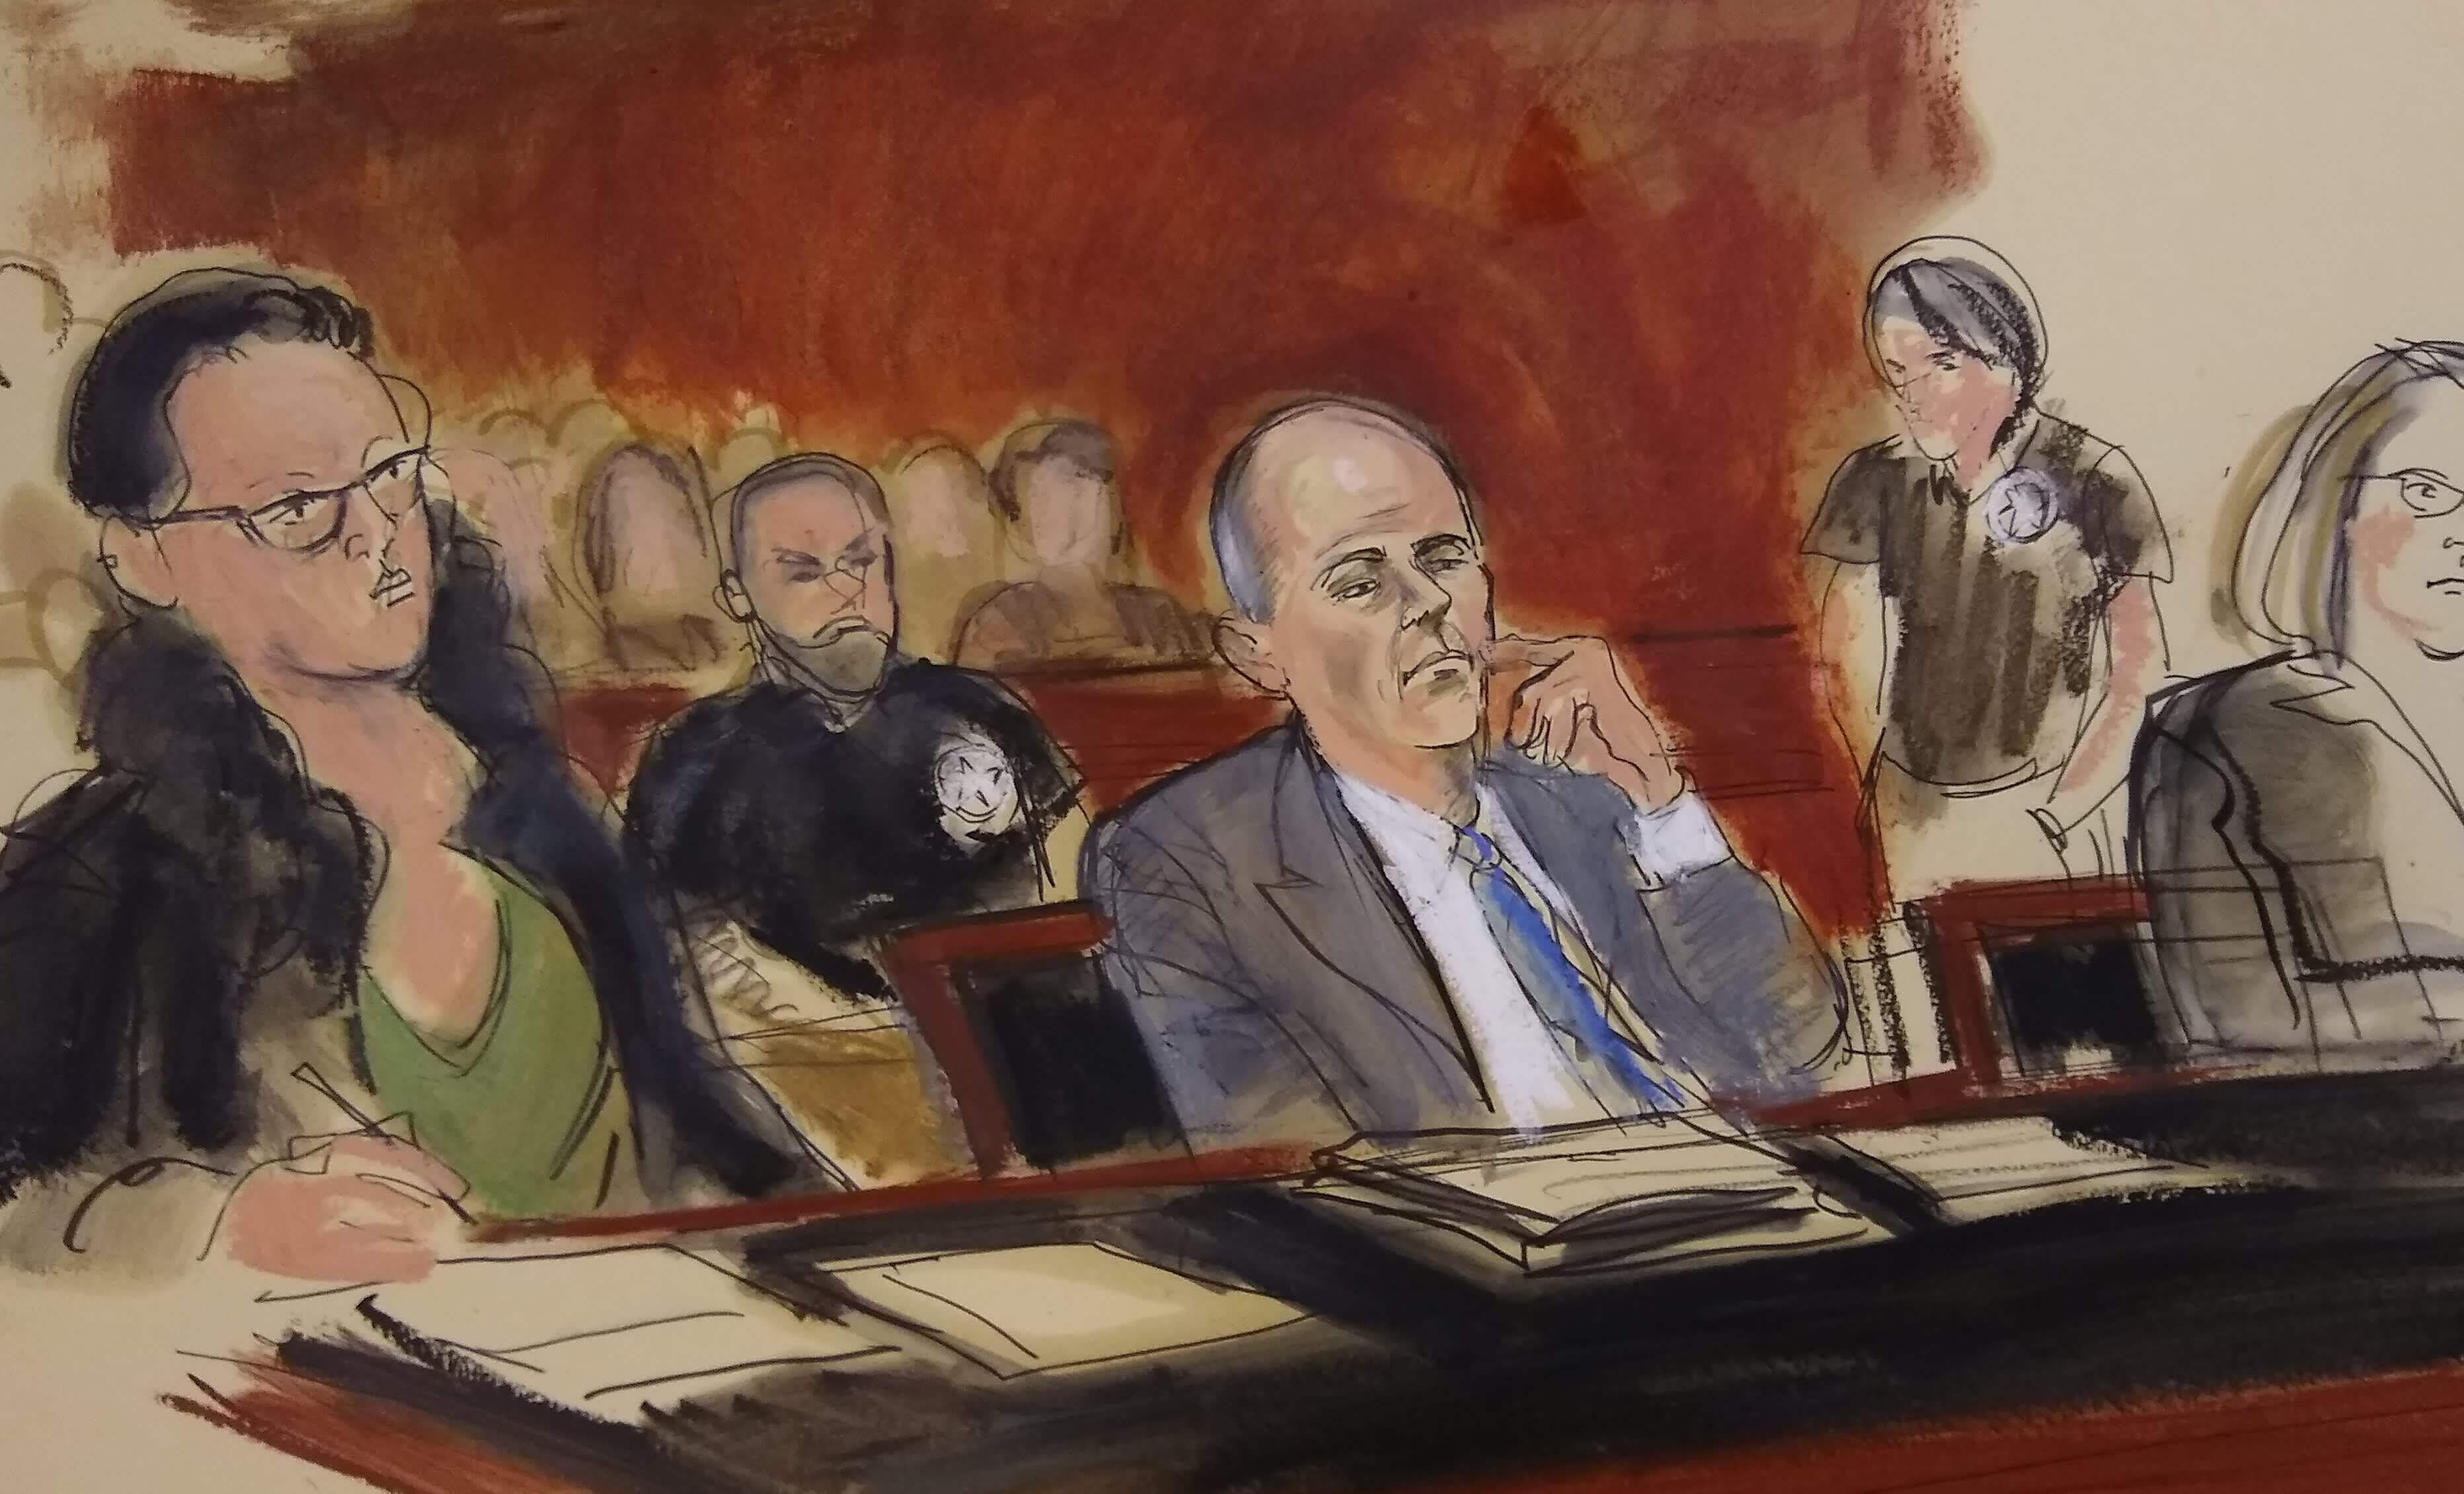 Avenatti arrested for alleged $20 million extortion plot against Nike, embezzling client's money